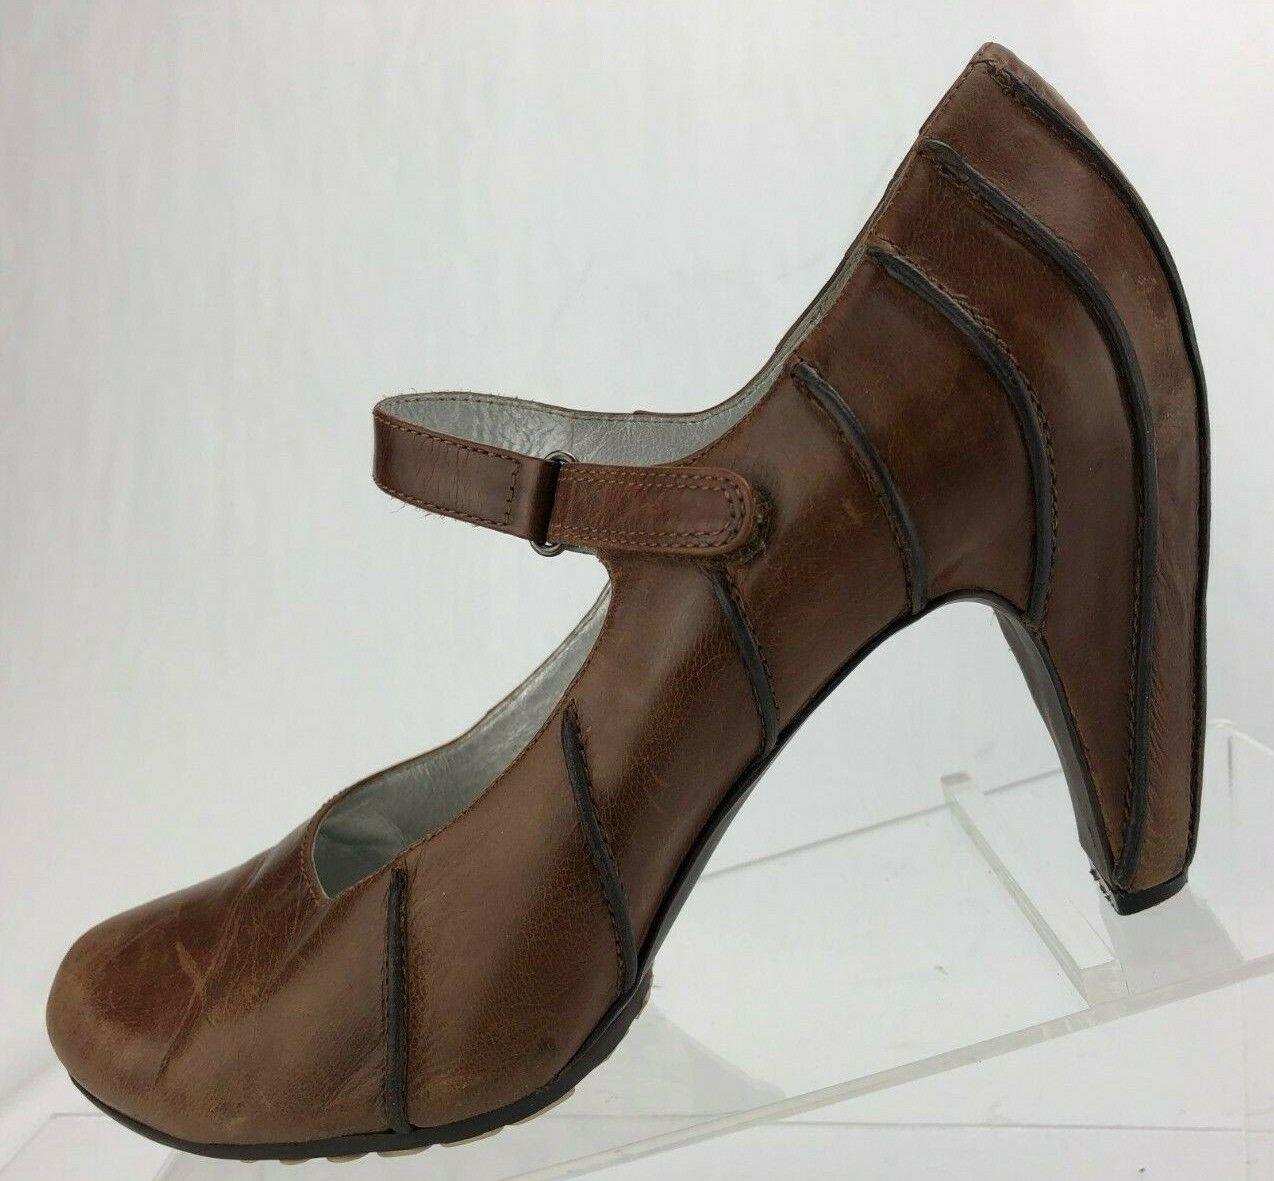 Tsubo Mary Jane Anush Brown Leather Classic Comfort Dress Pump Heels Womens Sz 8